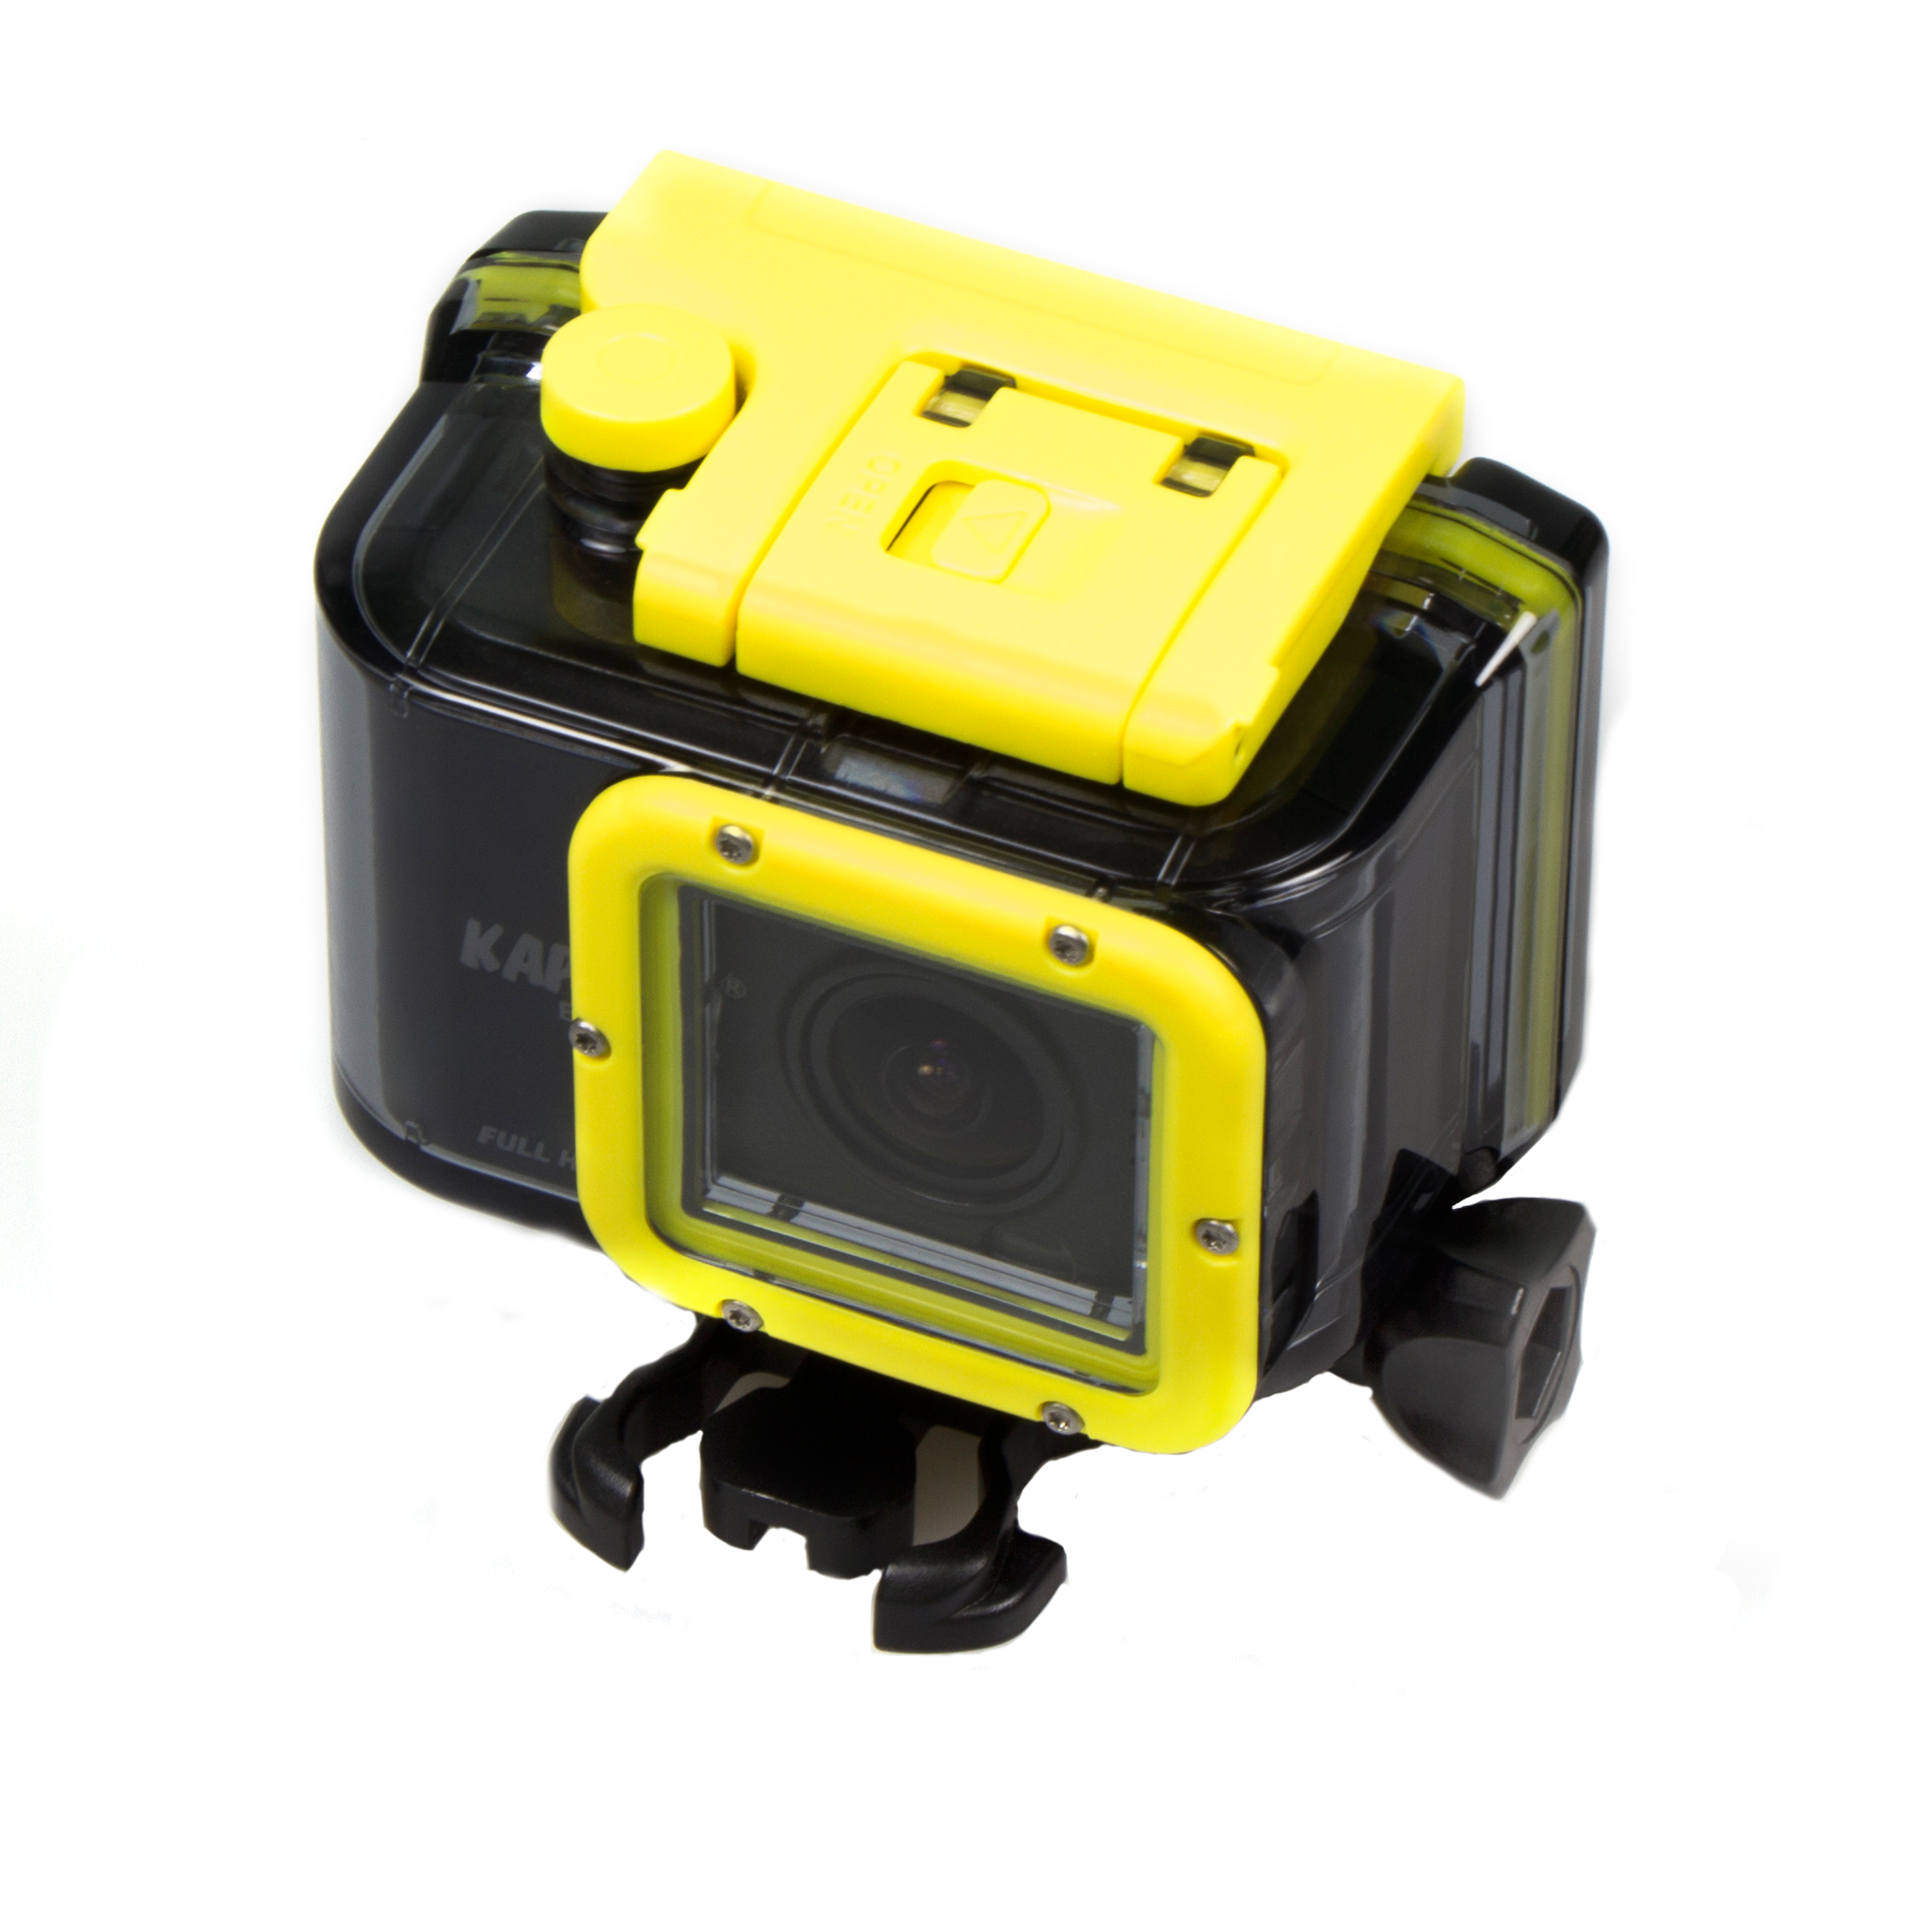 Excam One экшн-камера от компании Каркам